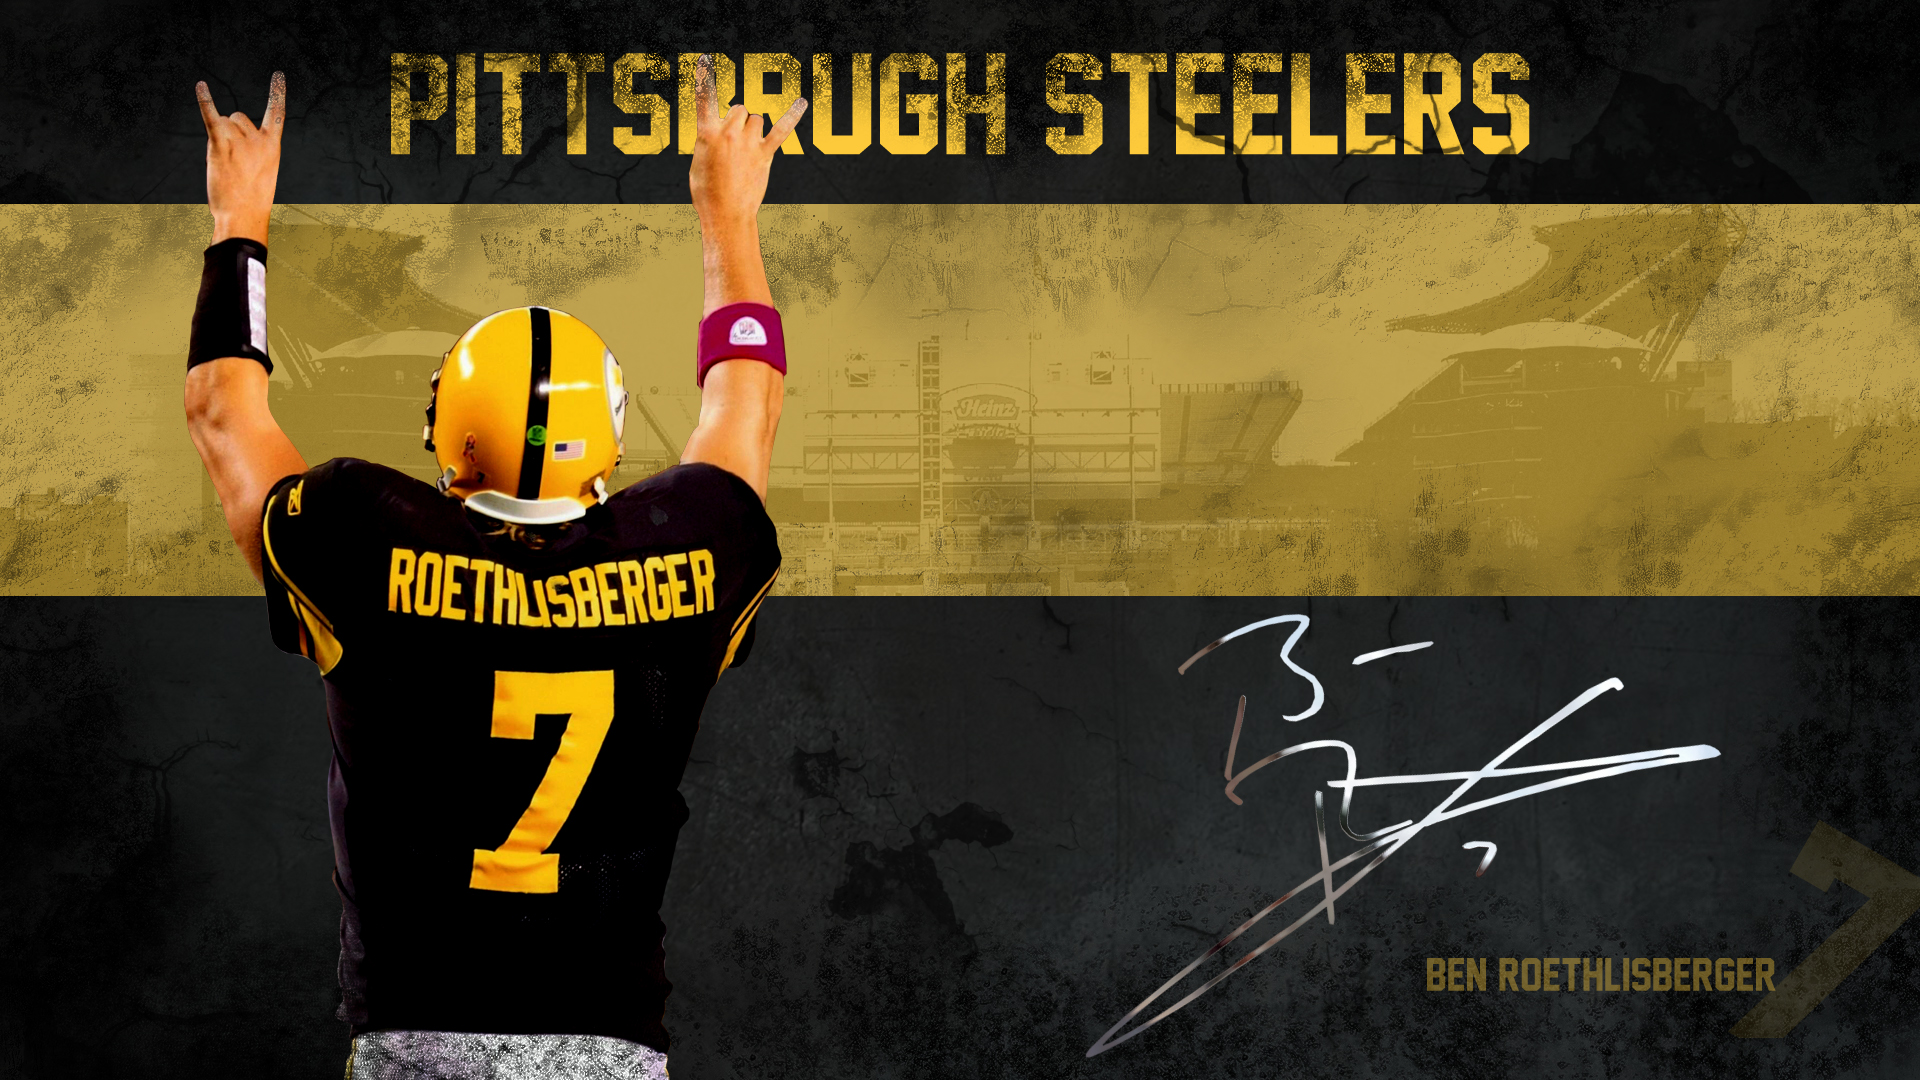 Pittsburgh Steelers HD desktop wallpaper 1920x1080